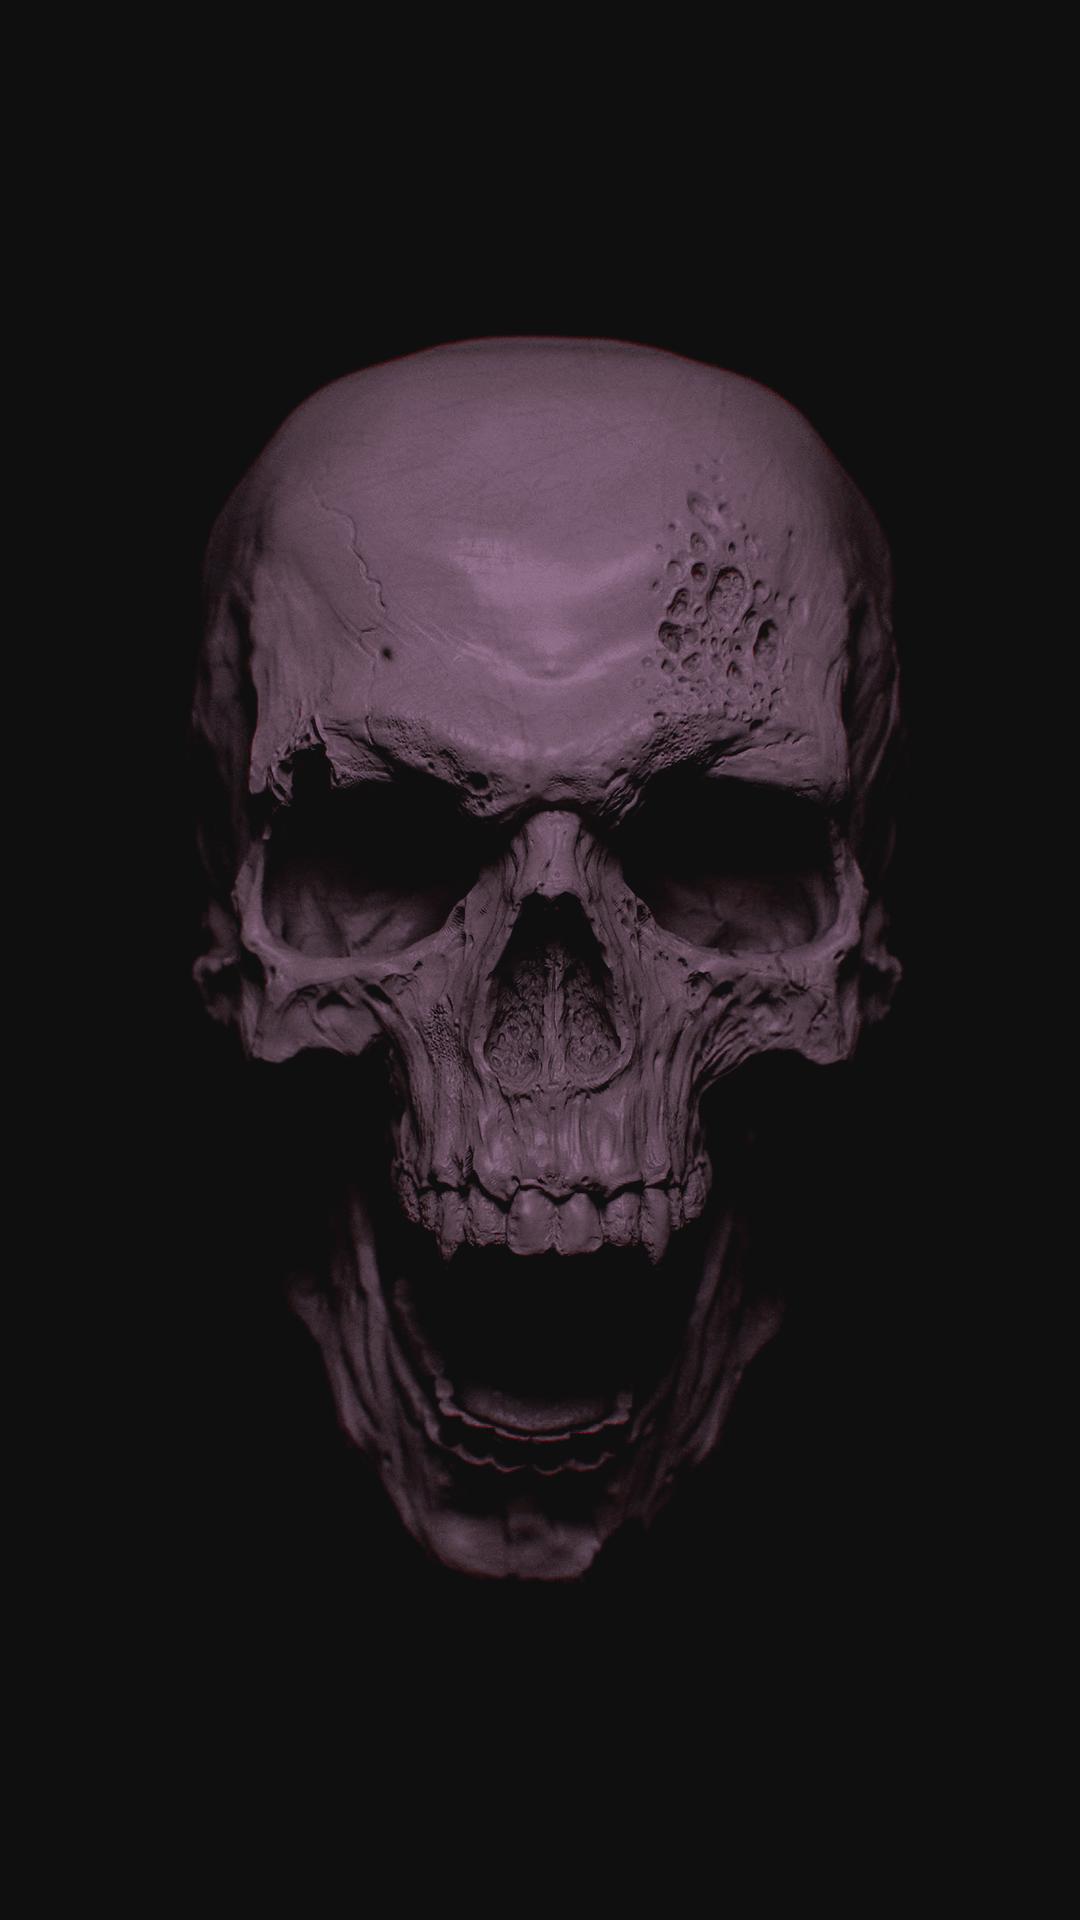 Apple Skull Iphone Wallpapers Top Free Apple Skull Iphone